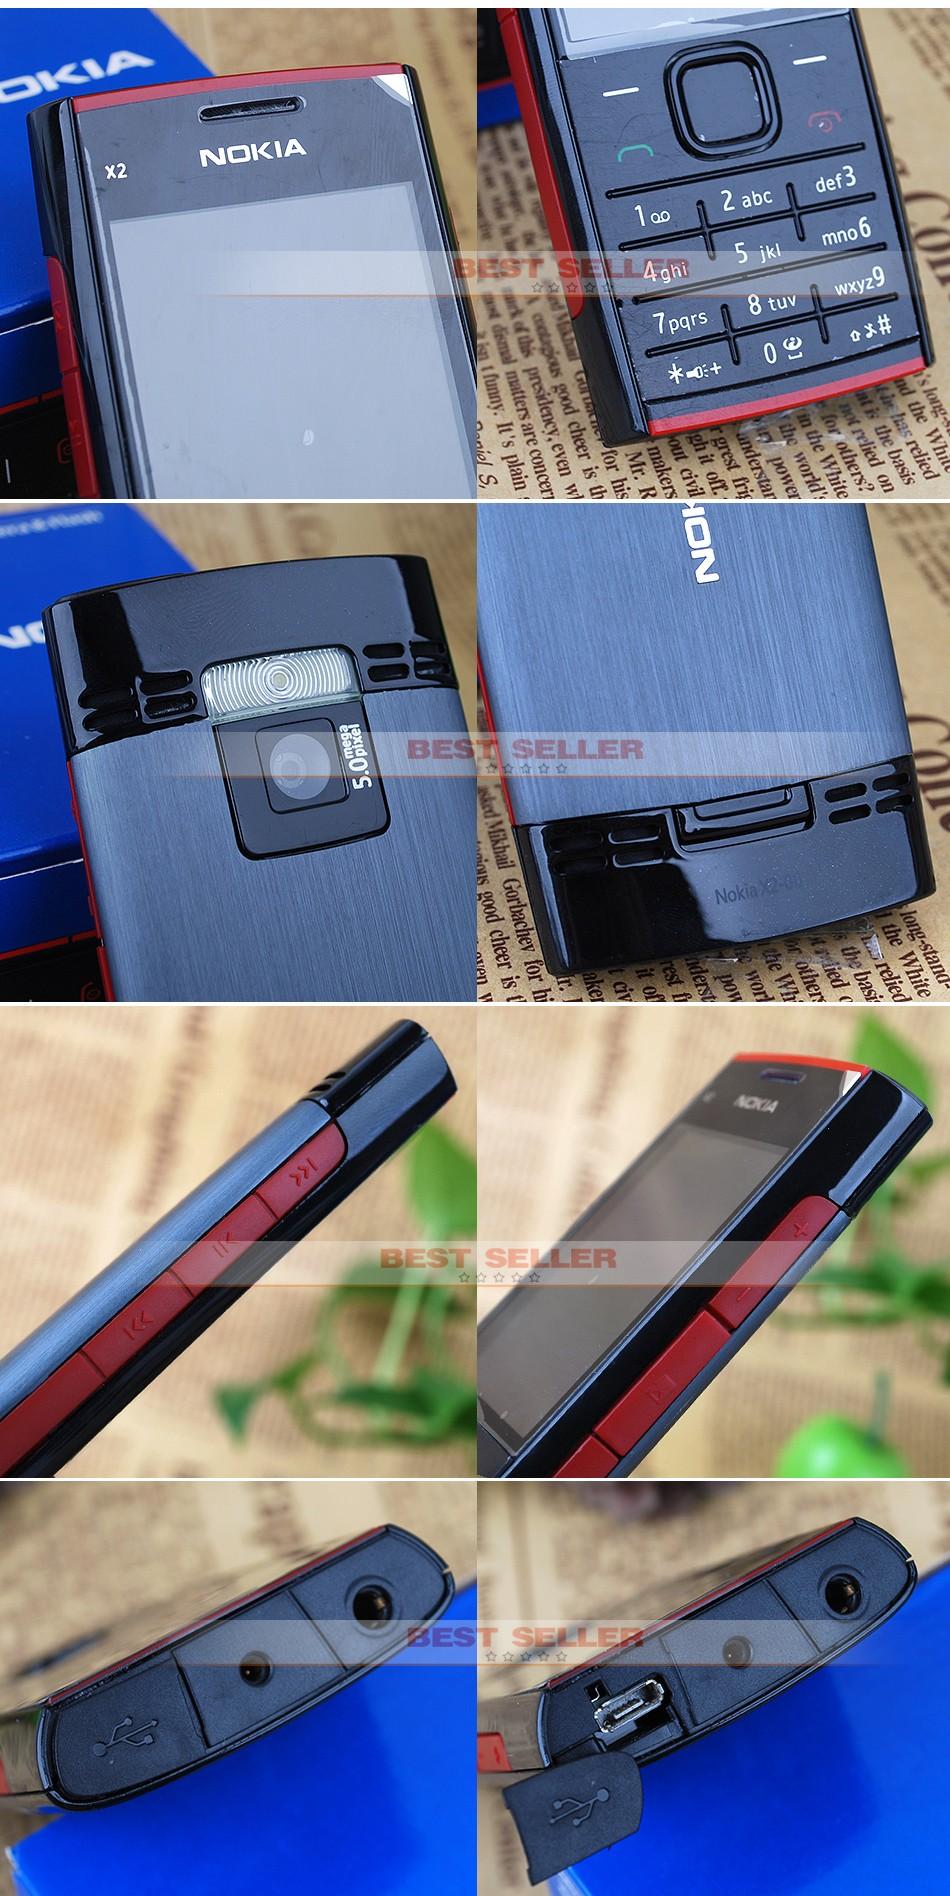 Refurbished phone Nokia X2-00 Bluetooth FM JAVA 5MP Cell Phones Free Shipping black 6